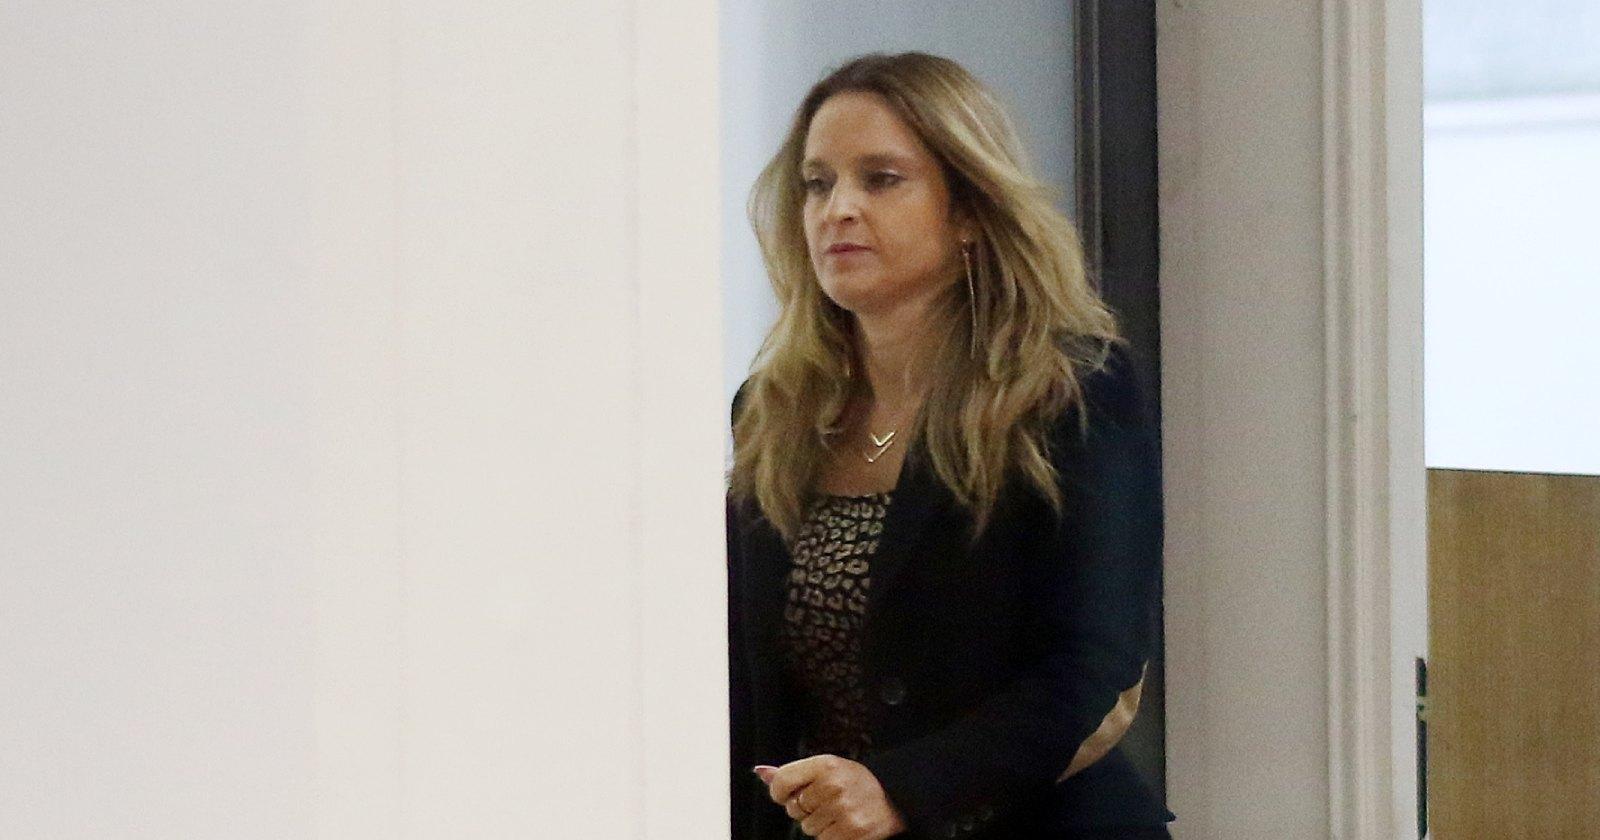 Ministra Rutherford recibe clon del fraude en el Ejército: acusan a la FACH de irregularidades en viáticos